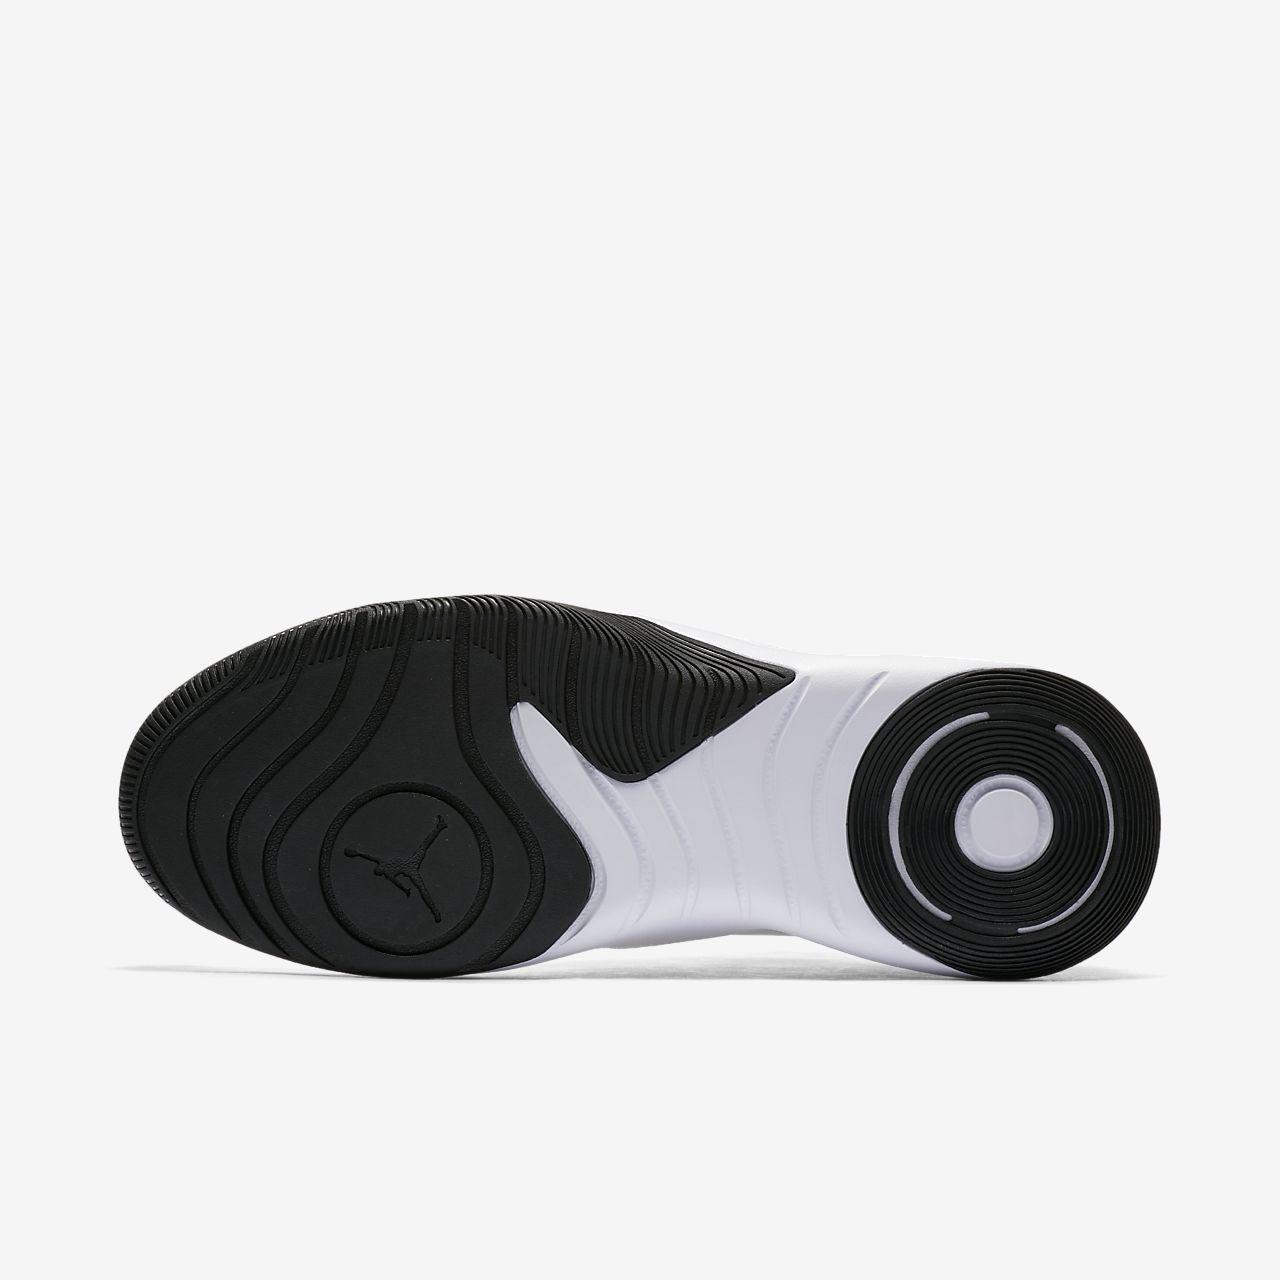 Pour Chaussure Dna HommeFr Pour Jordan Jordan HommeFr Dna Chaussure cFJl1TK